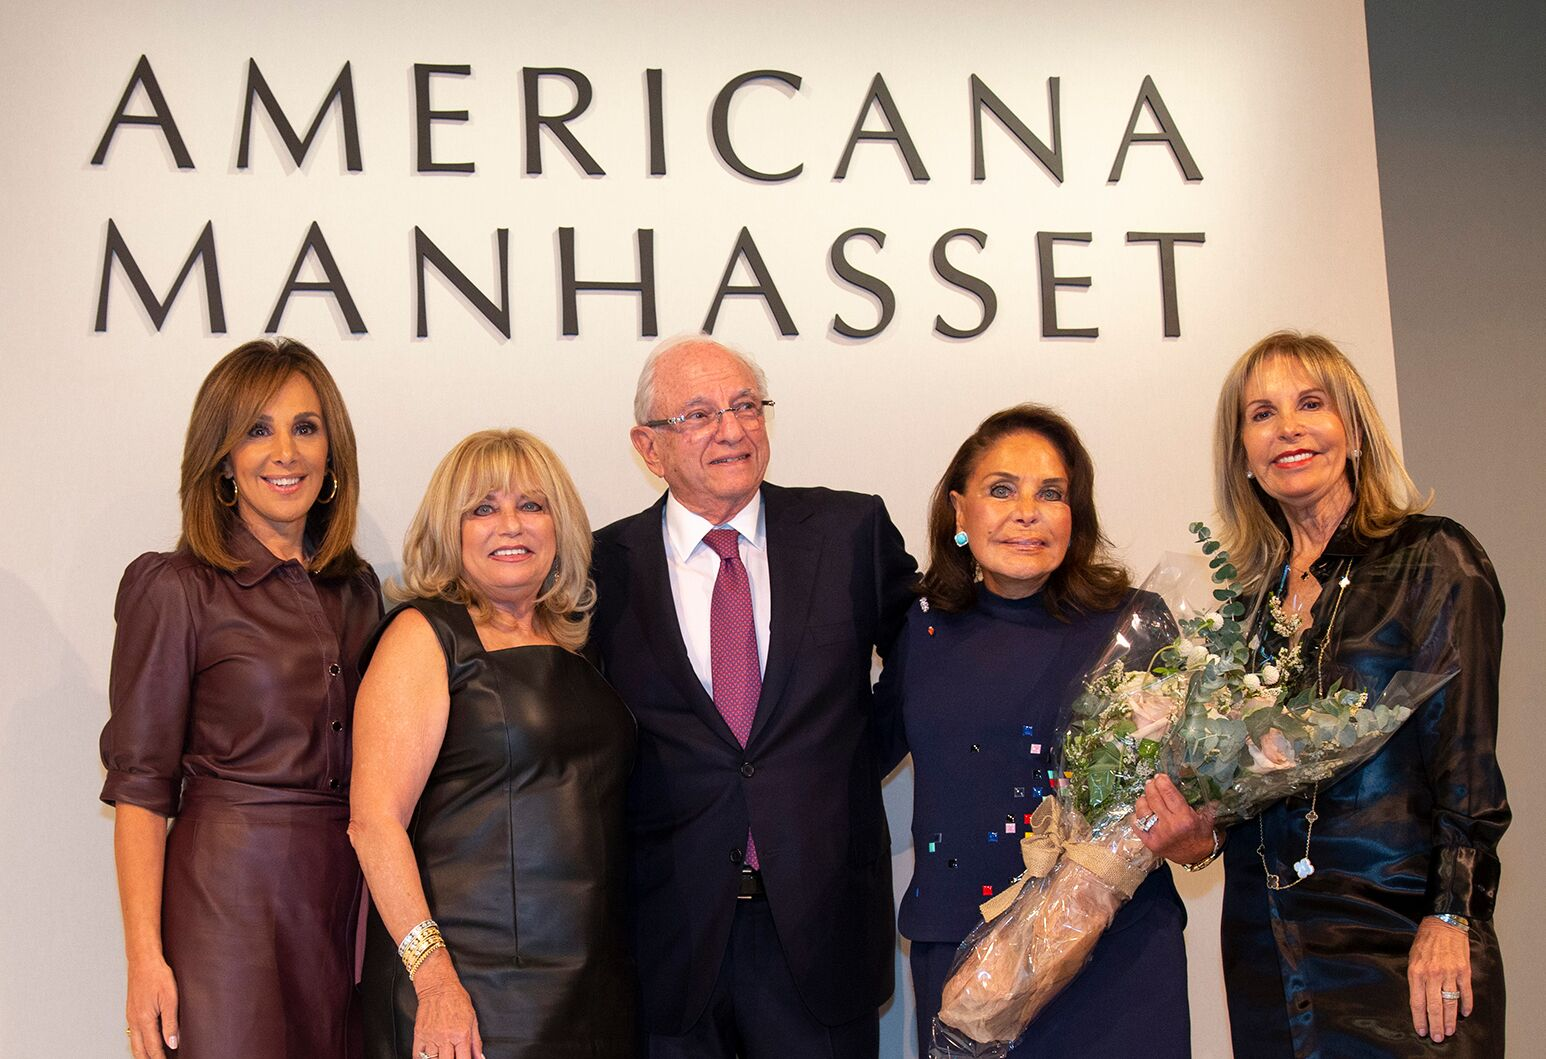 From left: Rosanna Scotto, Ruth Slade, Roger and Charlotte Blumencranz, Dayle Katz.